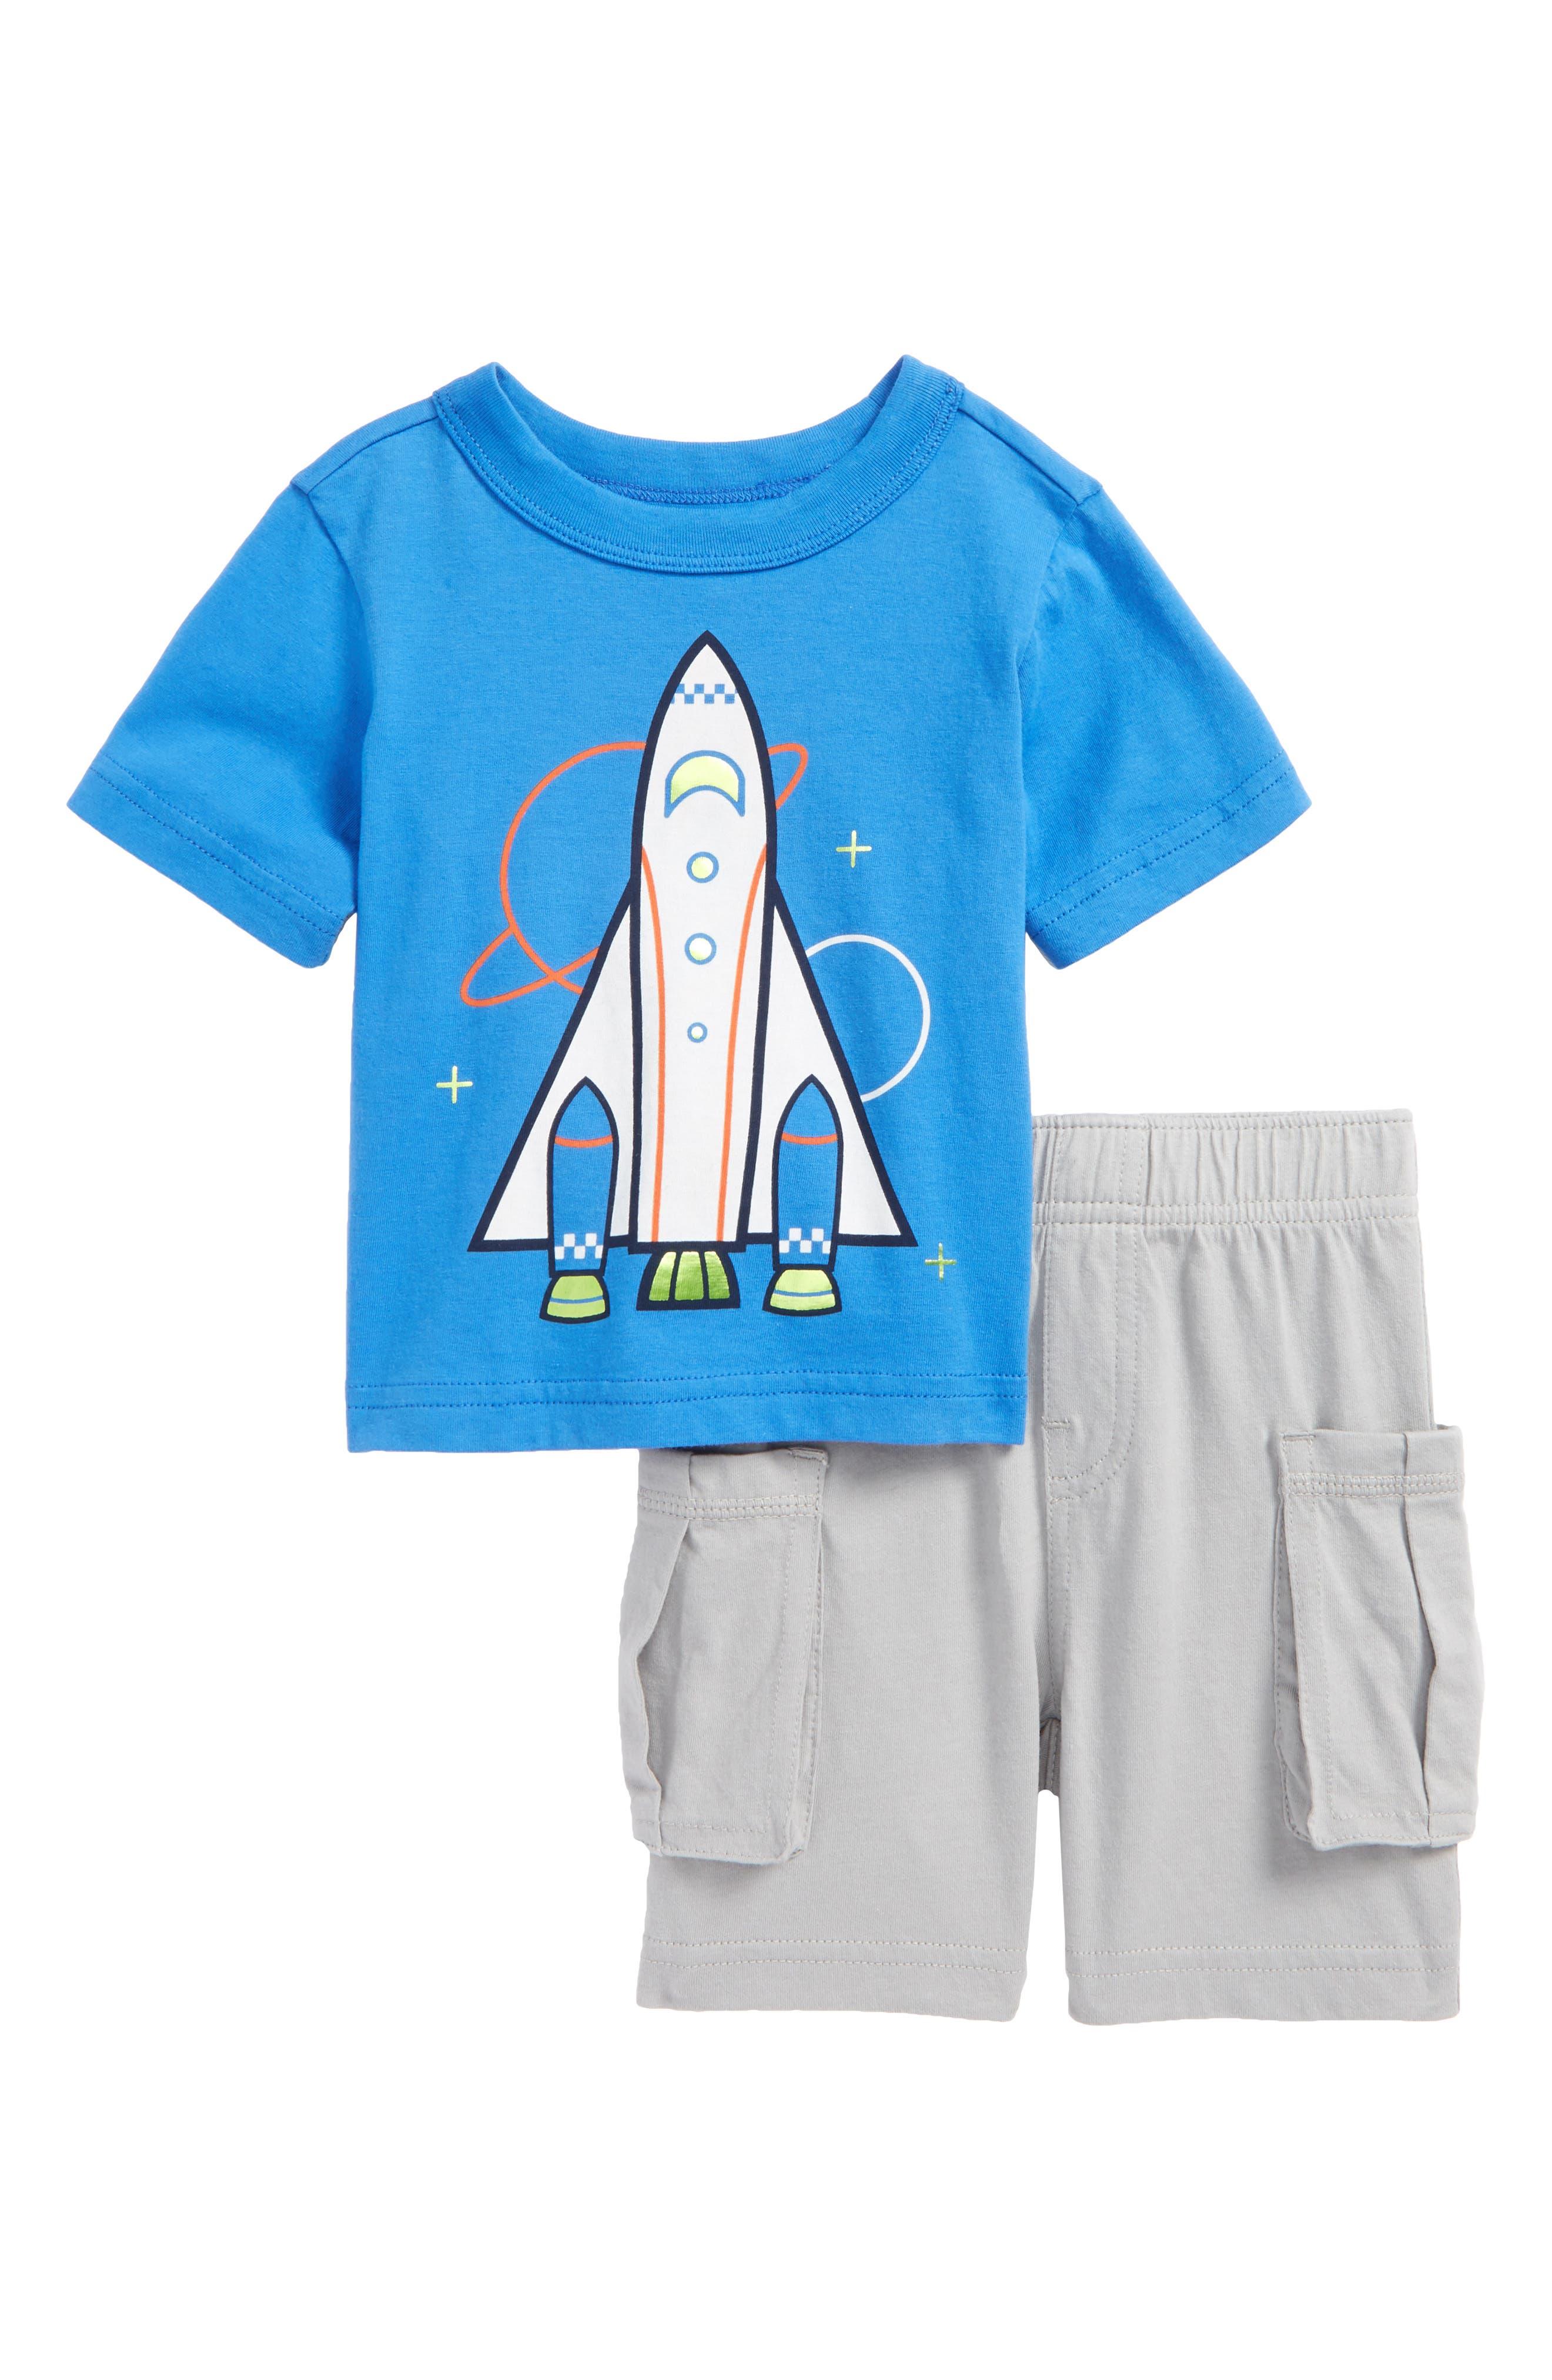 Spaceship Graphic T-Shirt & Cargo Shorts Set,                             Main thumbnail 1, color,                             425